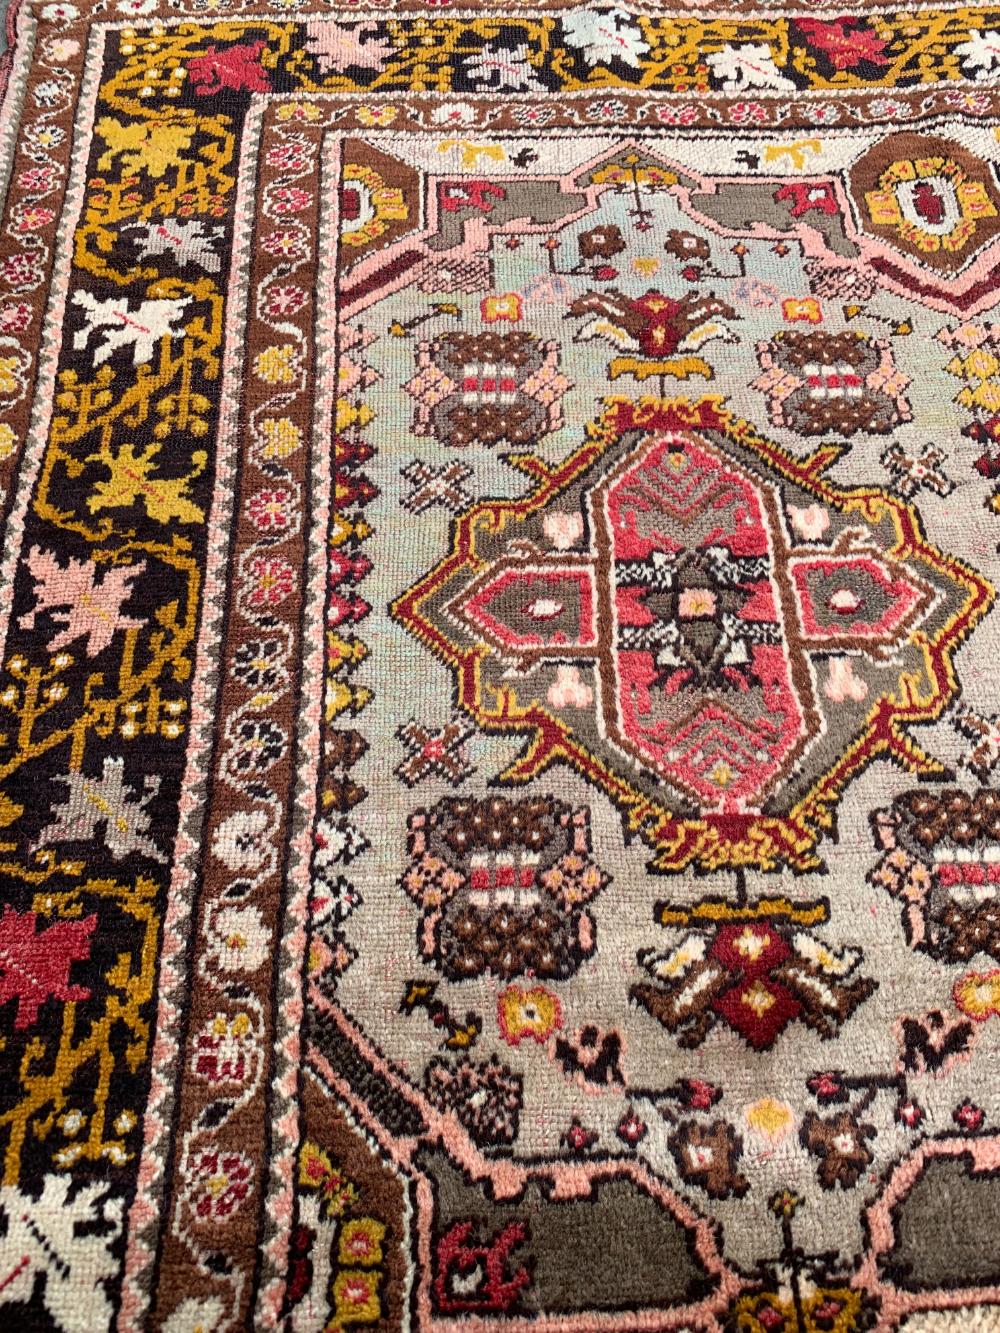 Vintage Handmade Geometric Design Village Faded Rug 4 6 6 6 Chairish Rugs Affordable Rugs Carpet Colors